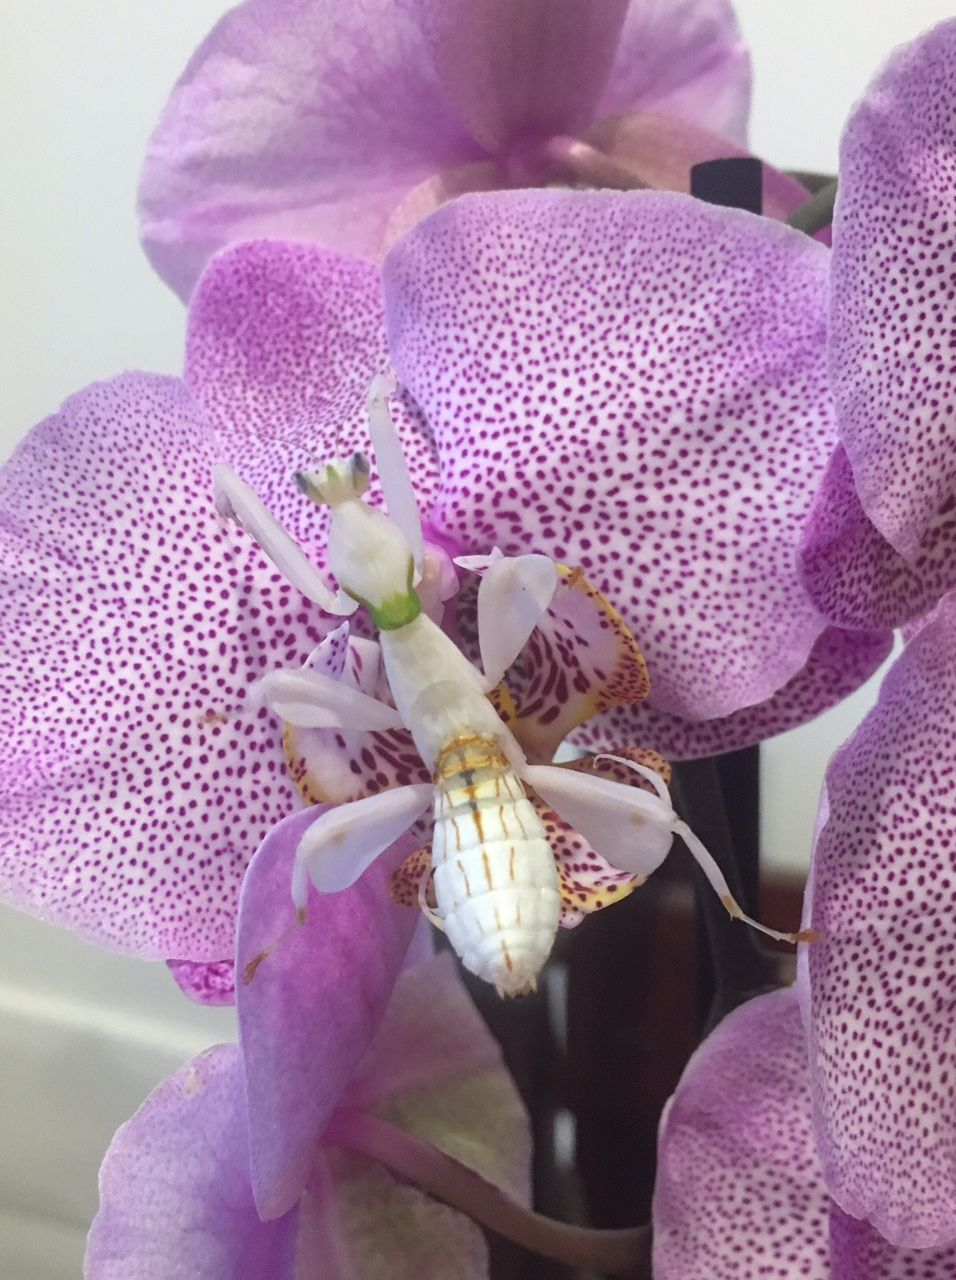 Buy Orchid Mantis Buy Orchids Orchid Mantis Orchids